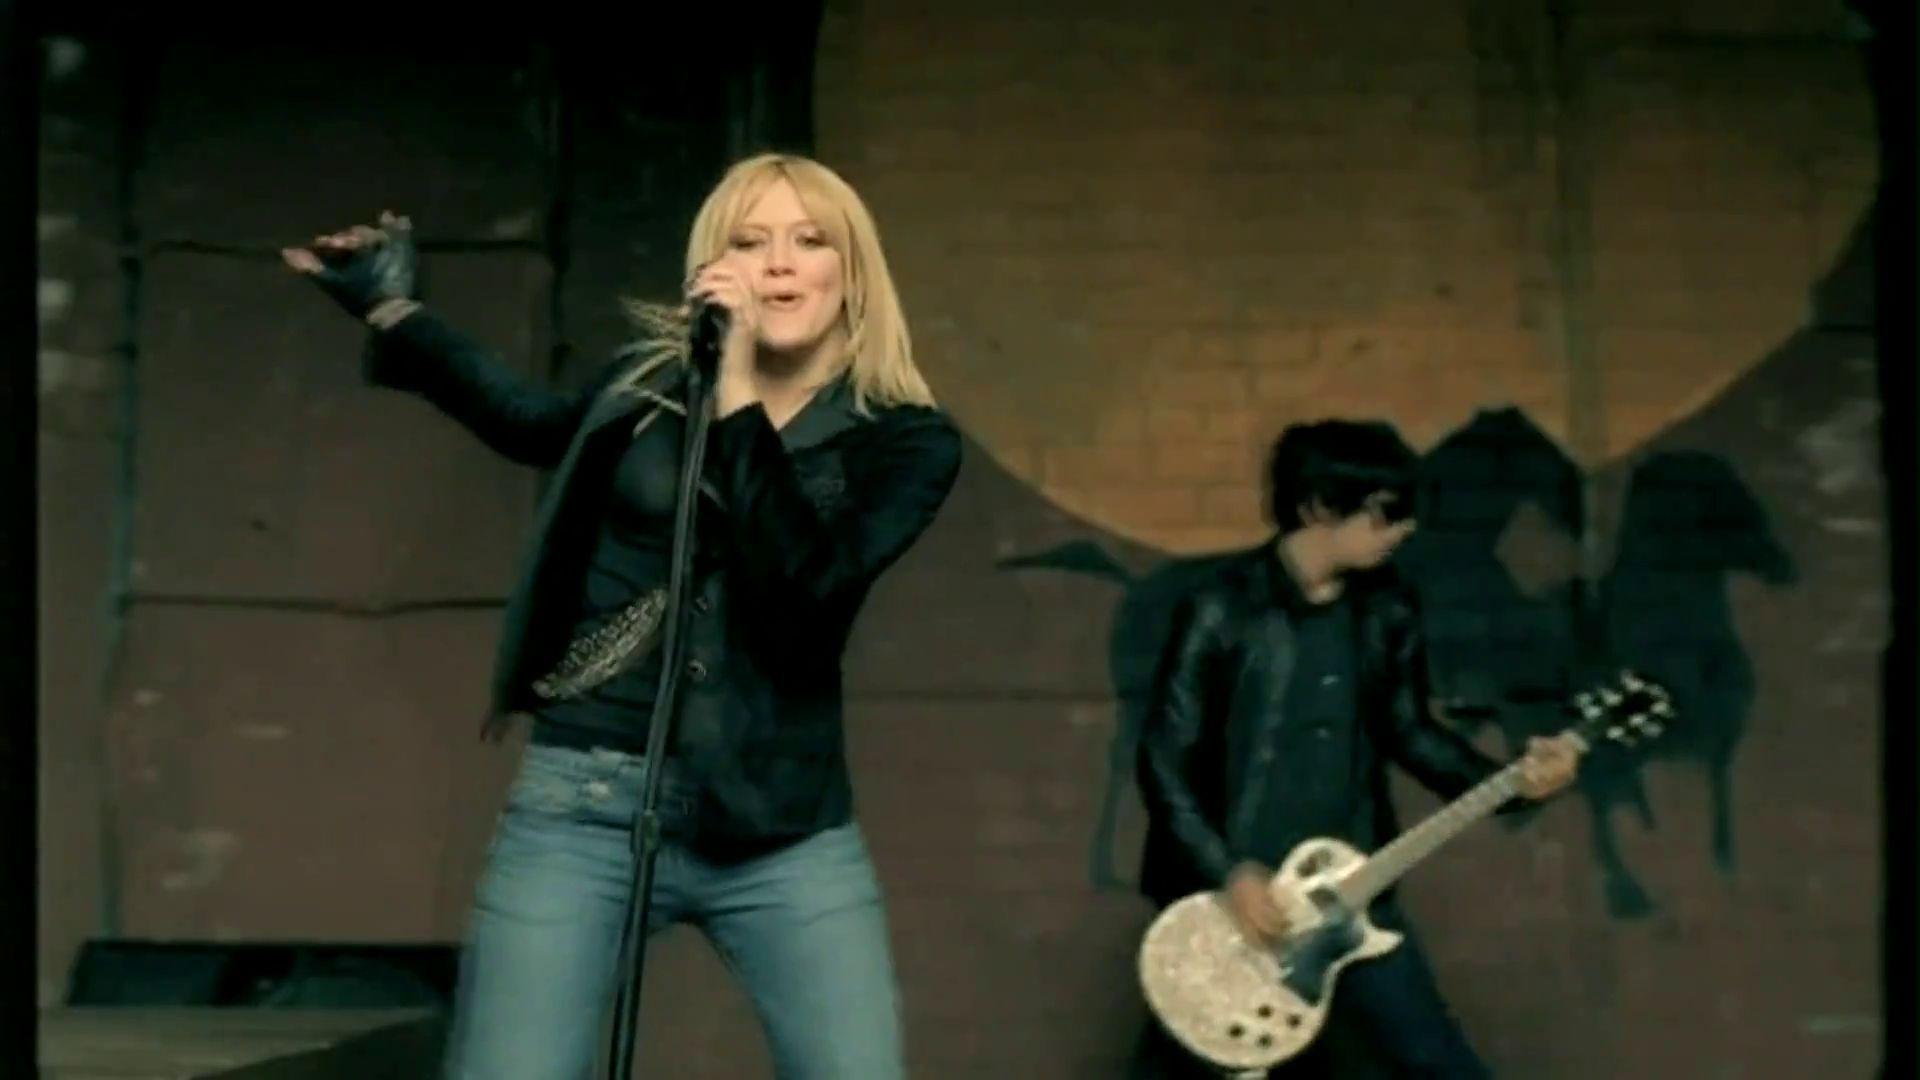 Hilary Duff - So Yeste... Hilary Duff Metamorphosis